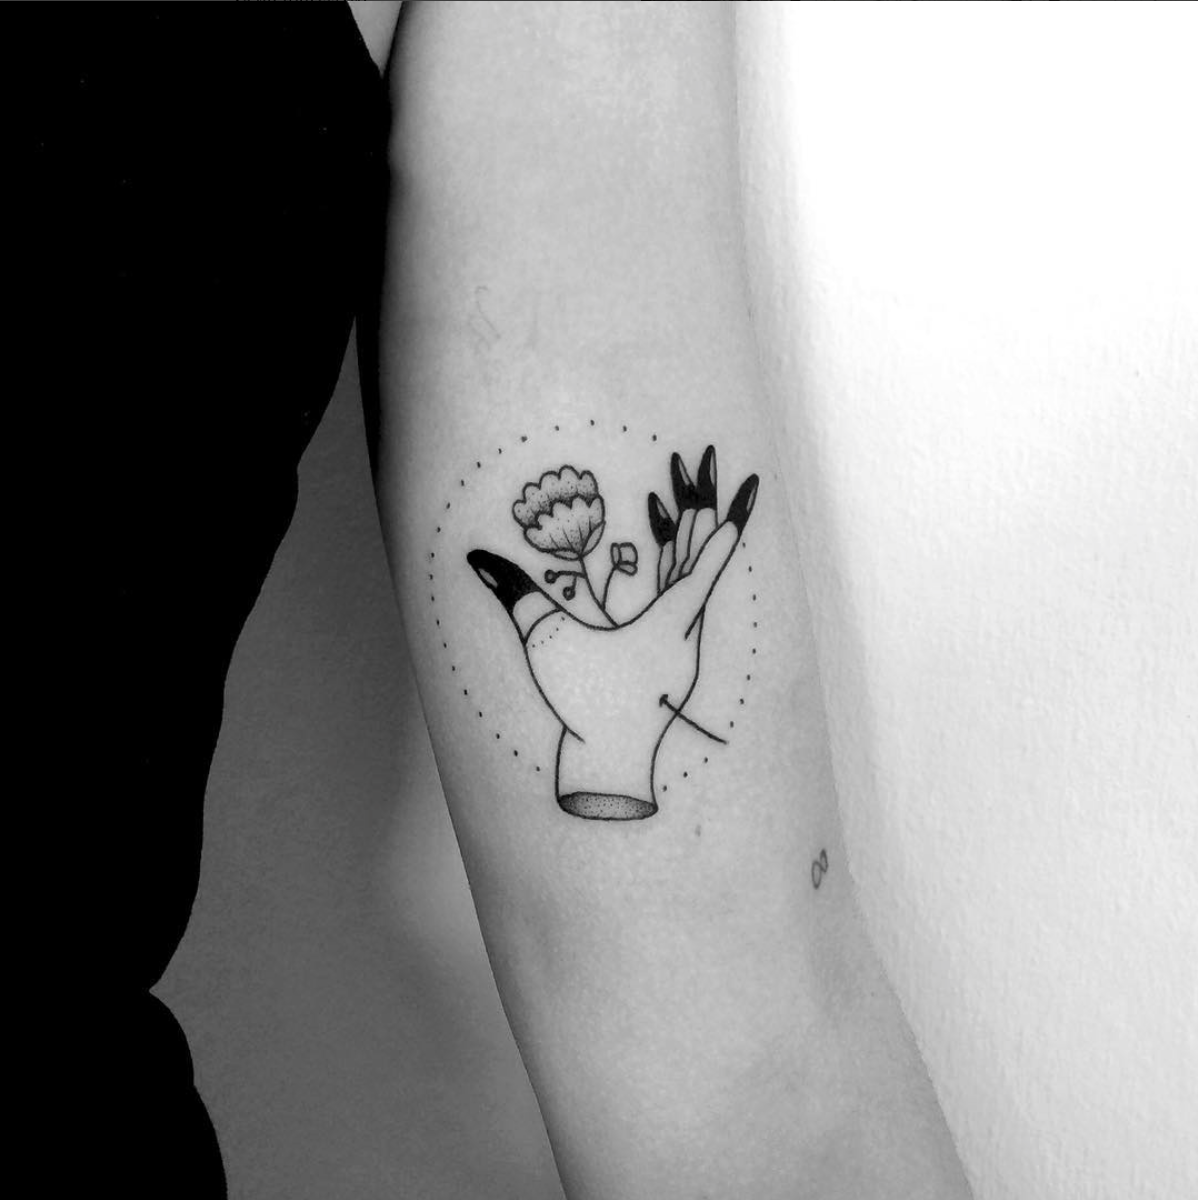 Tami_Hopf, les tatouages faits de points